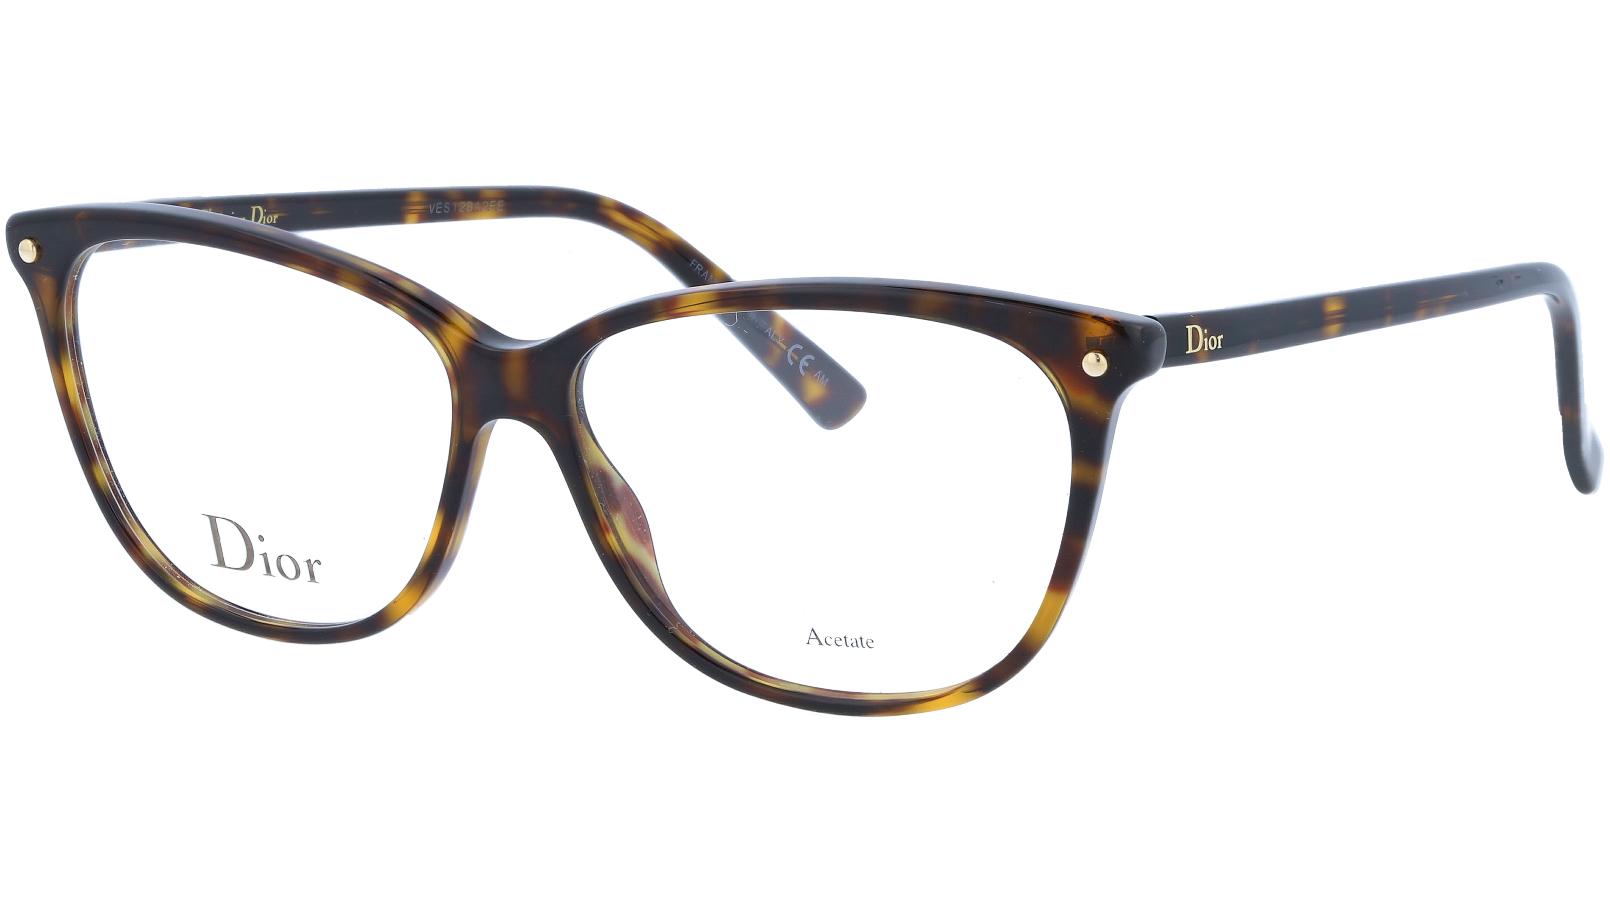 Dior CD3270 086 53 Dark Glasses